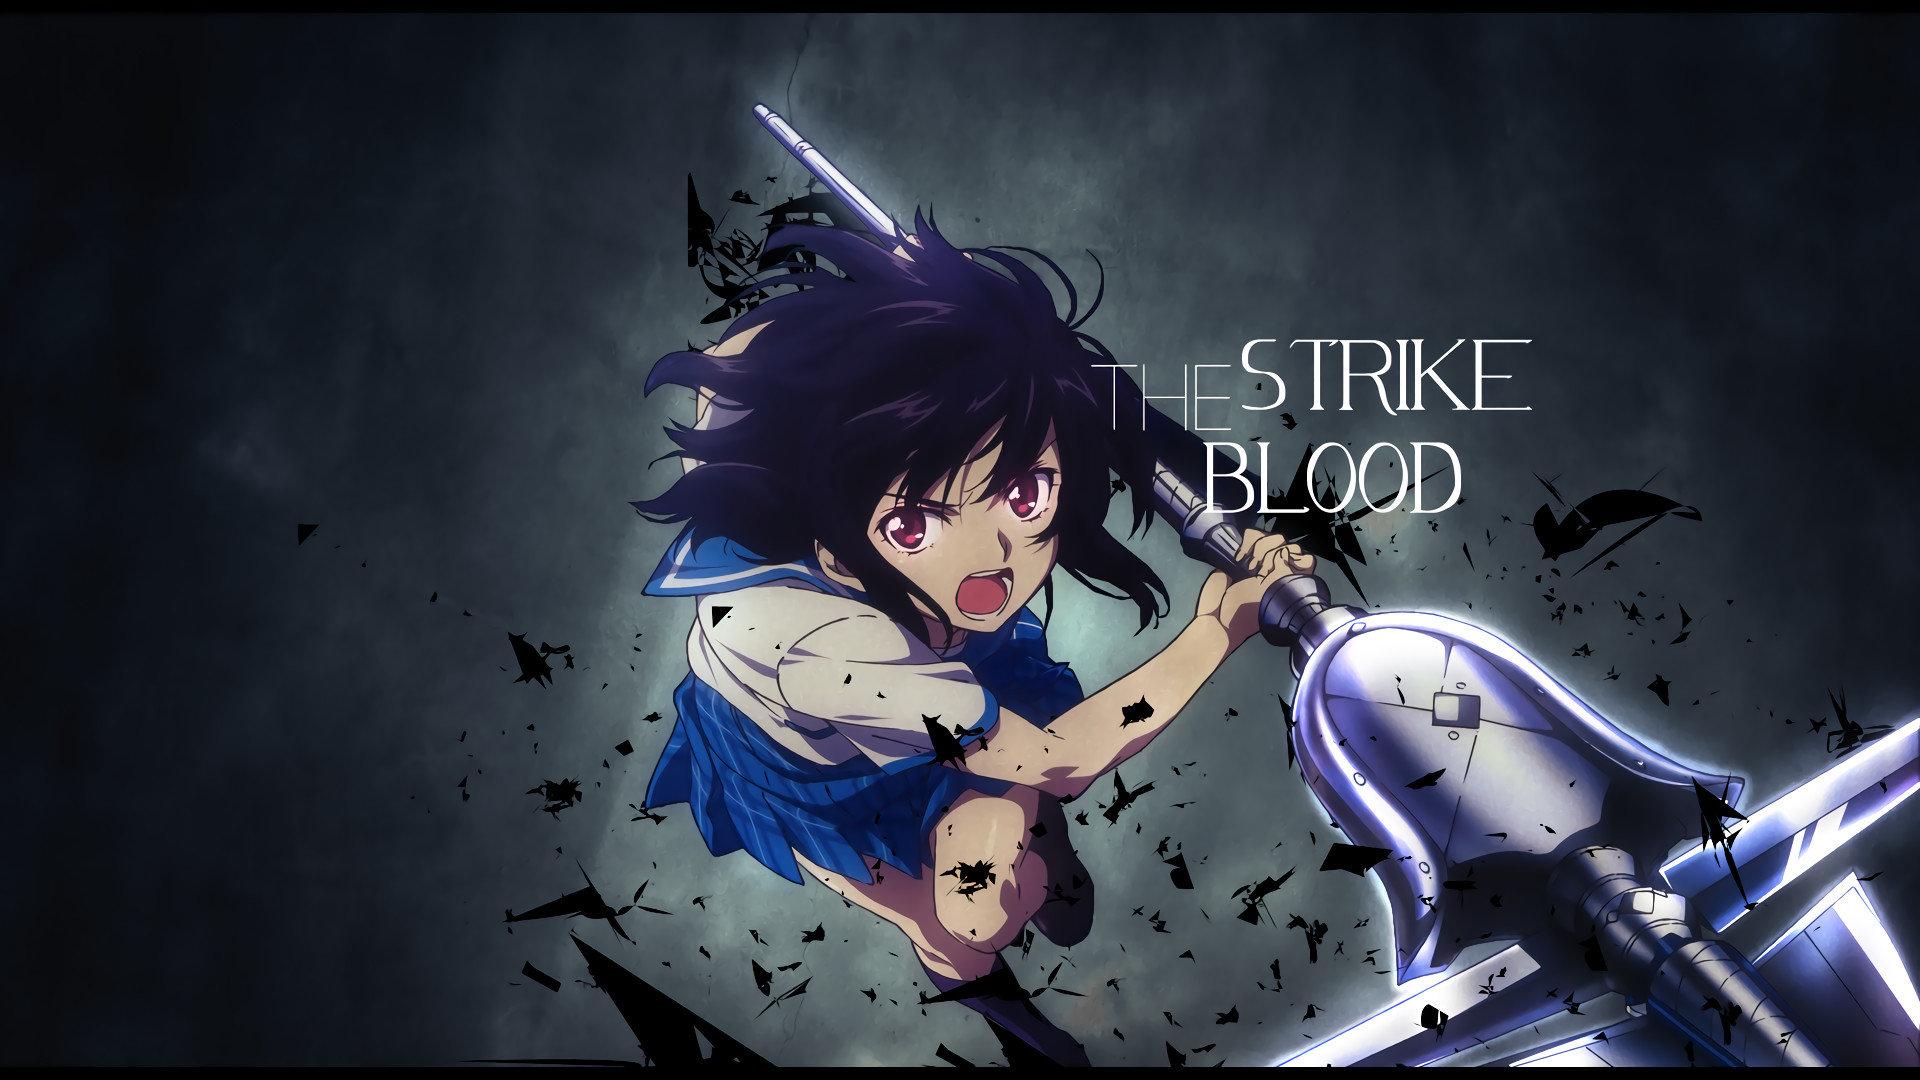 Strike The Blood Wallpapers 1920x1080 Full Hd 1080p Desktop